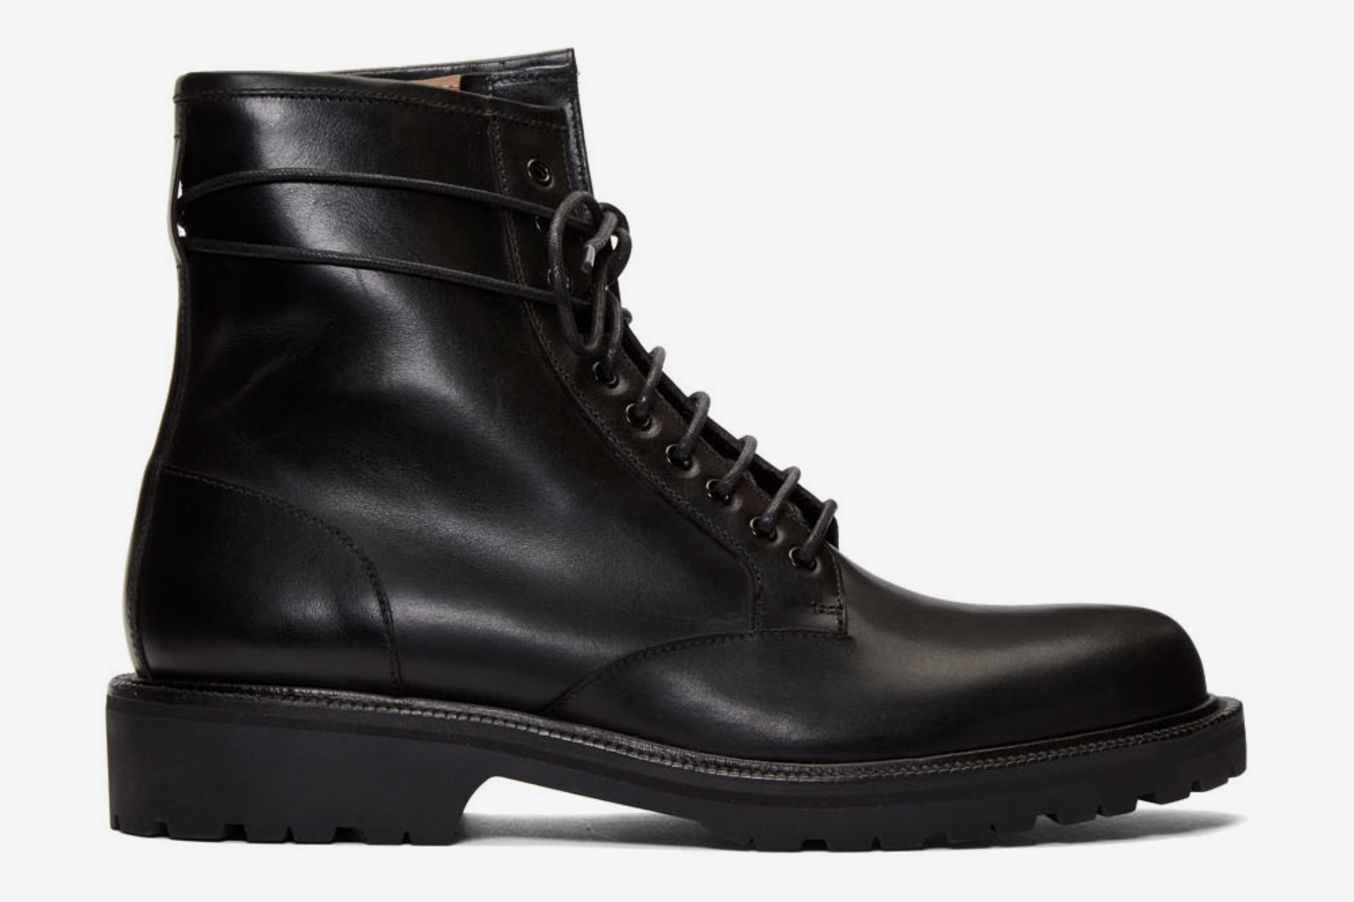 Dries Van Noten Black Lace-Up Combat Boots